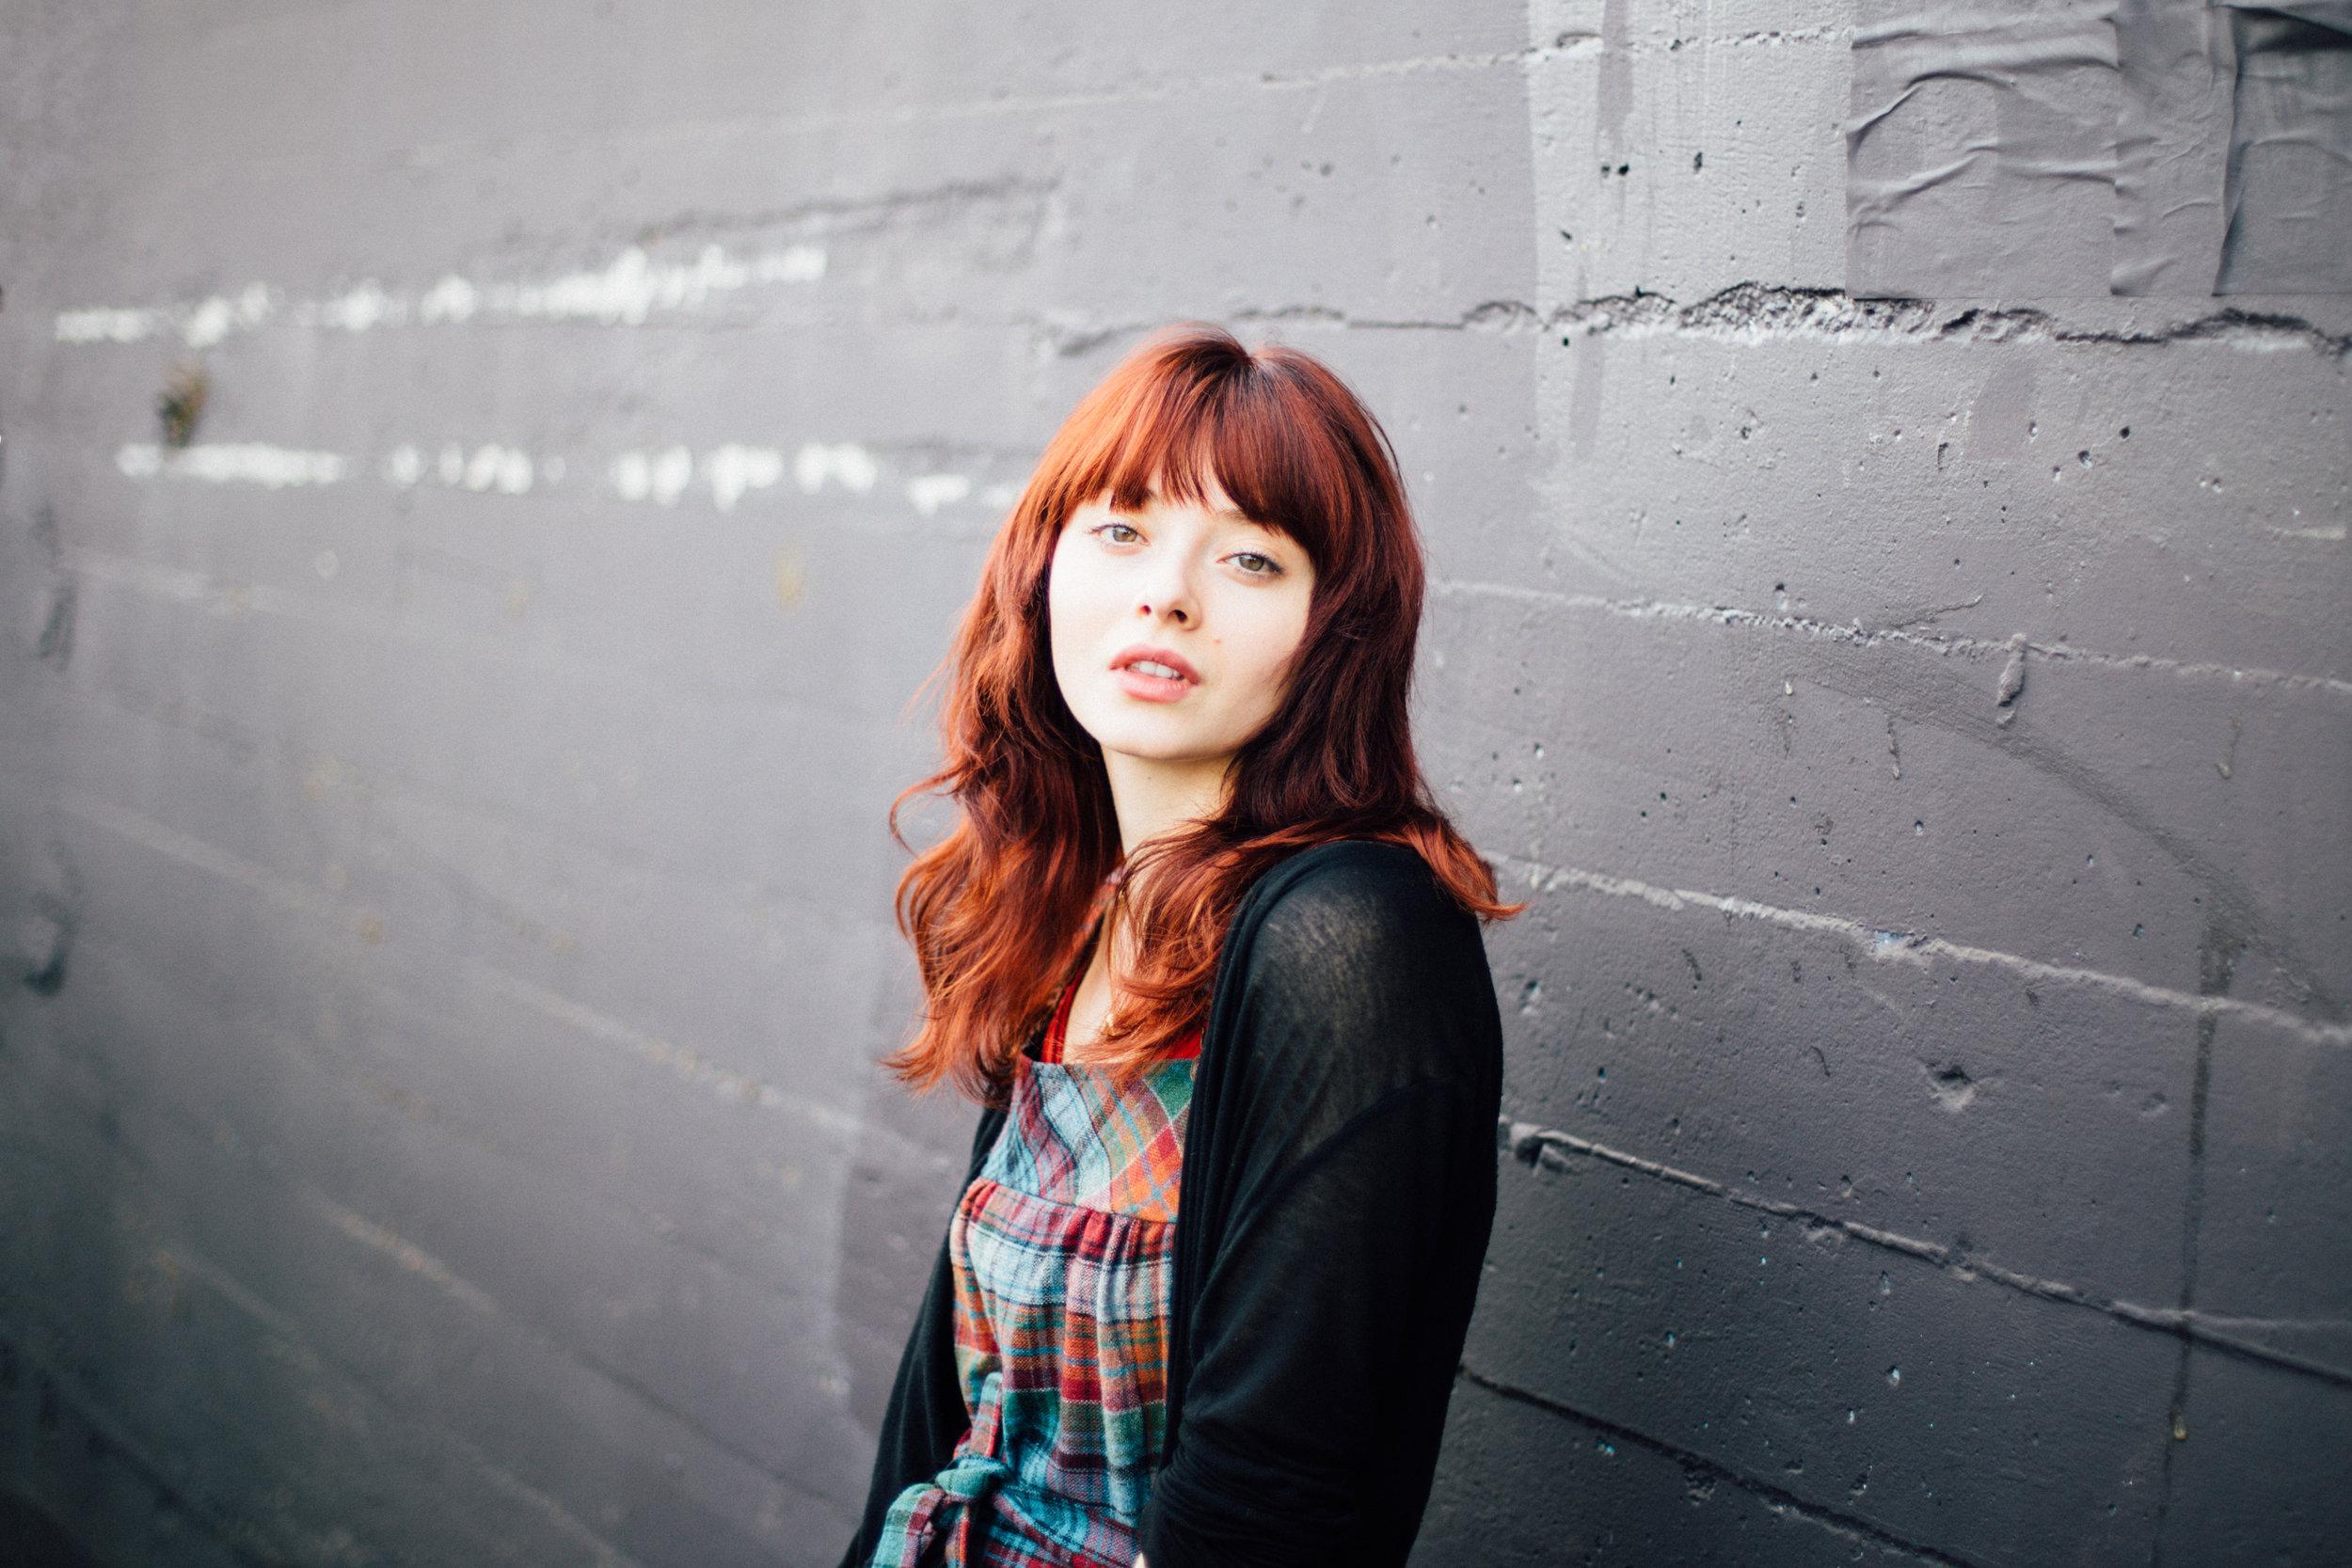 Alina Phillips